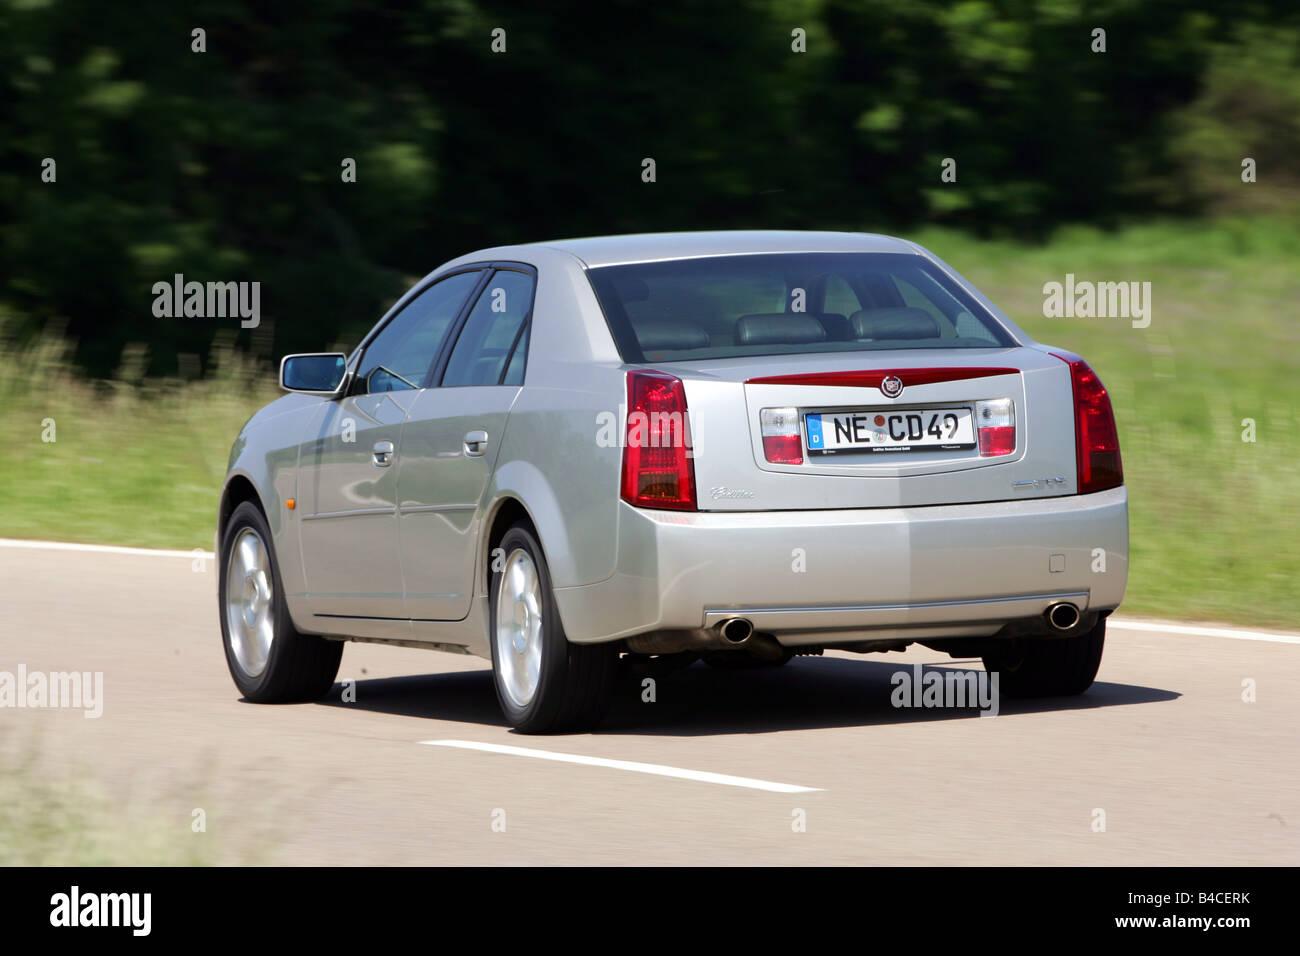 Cadillac Cts 3 6 V6 Stock Photos & Cadillac Cts 3 6 V6 Stock Images